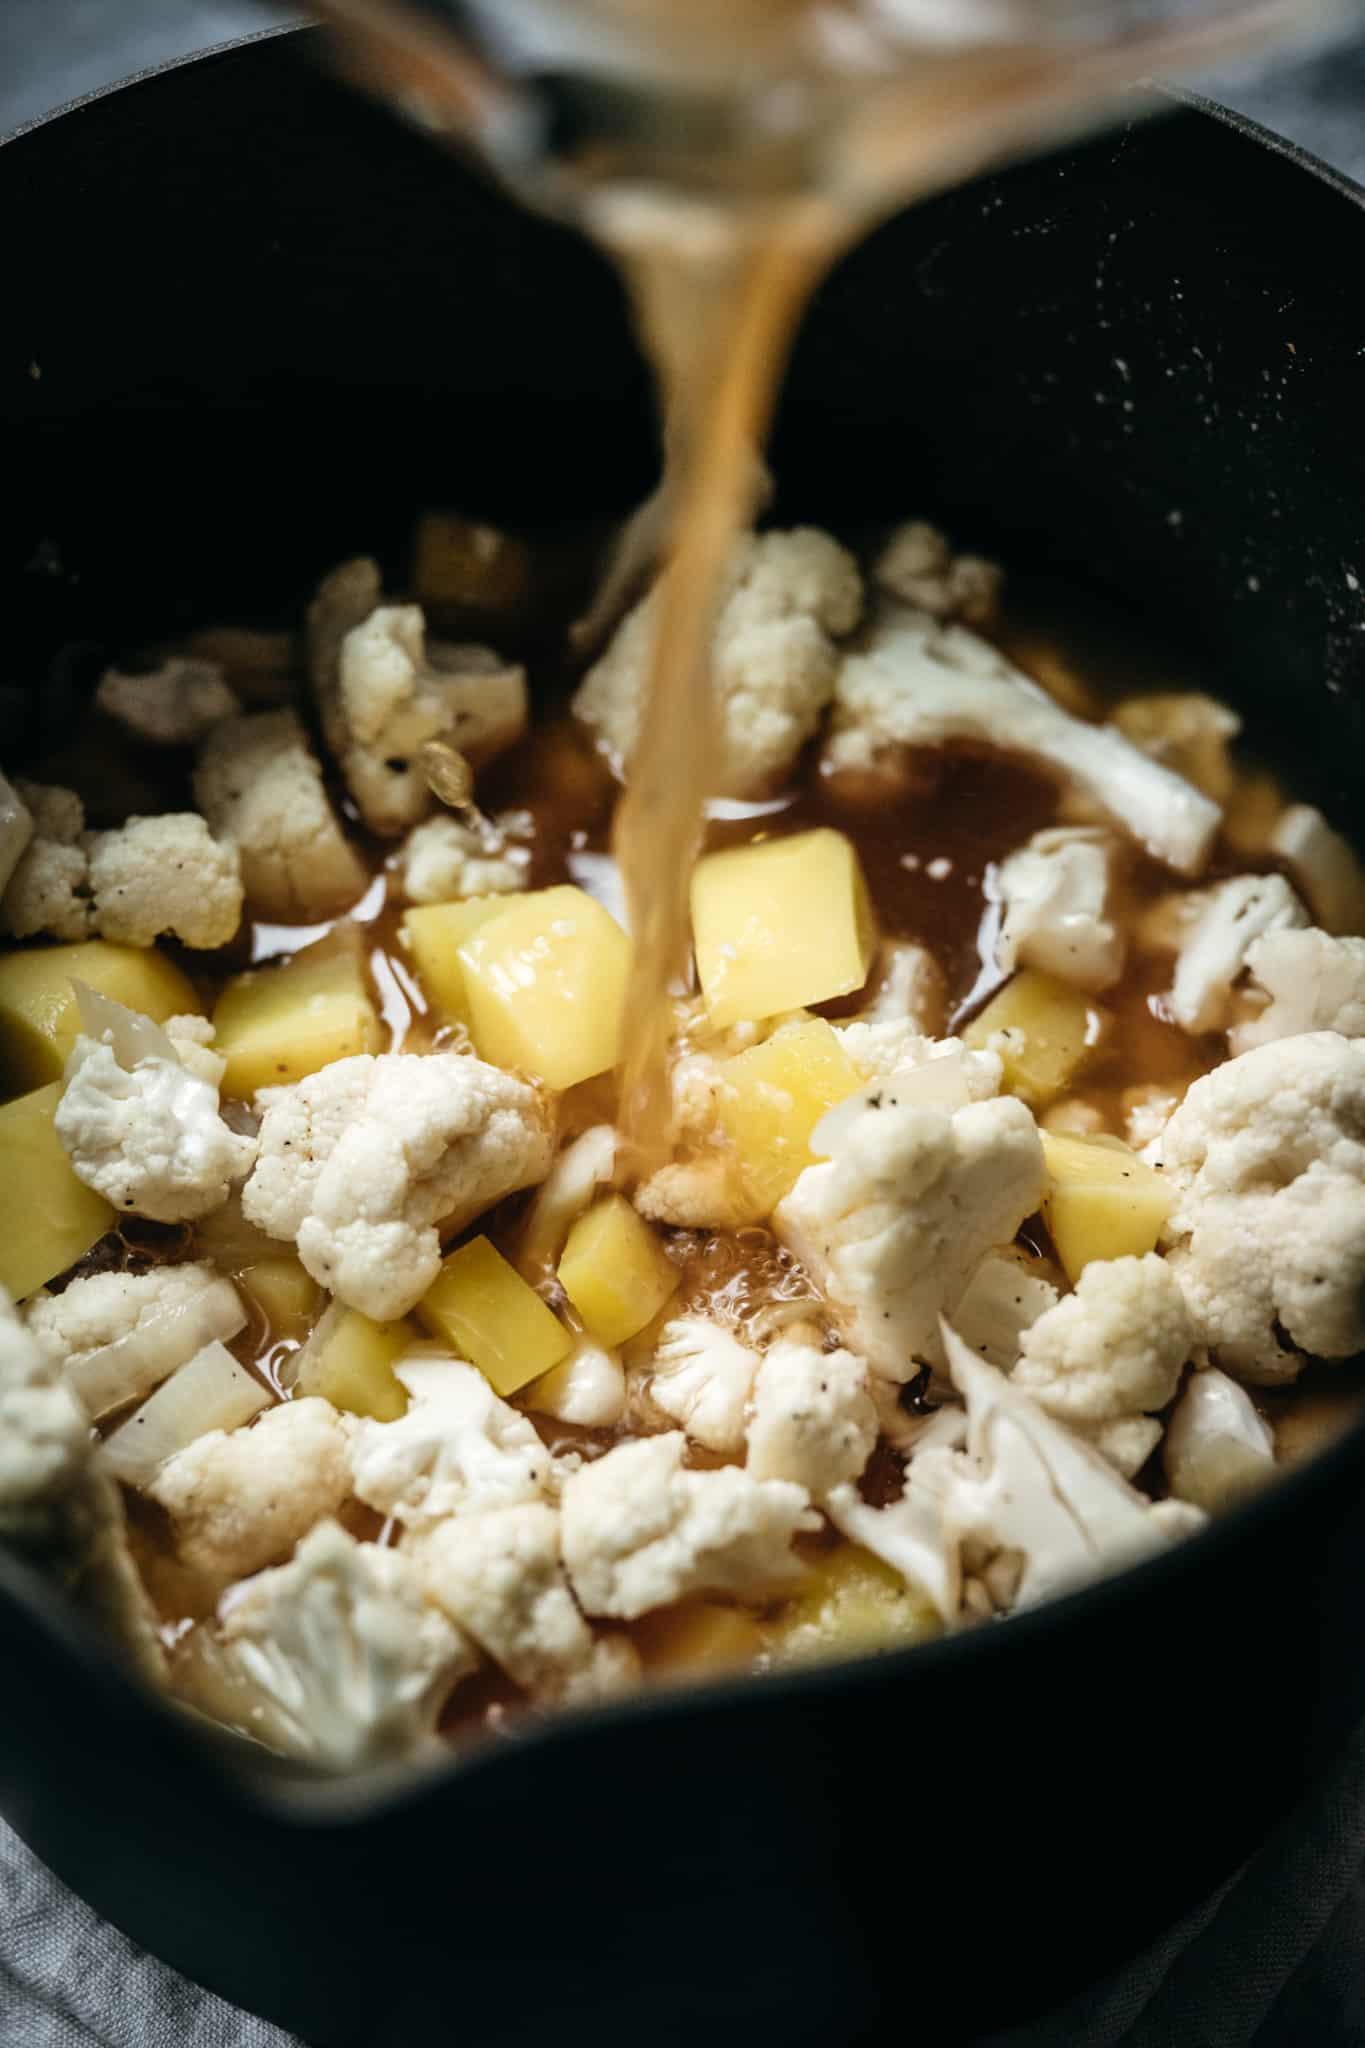 Pouring vegetable broth into cauliflower potato soup